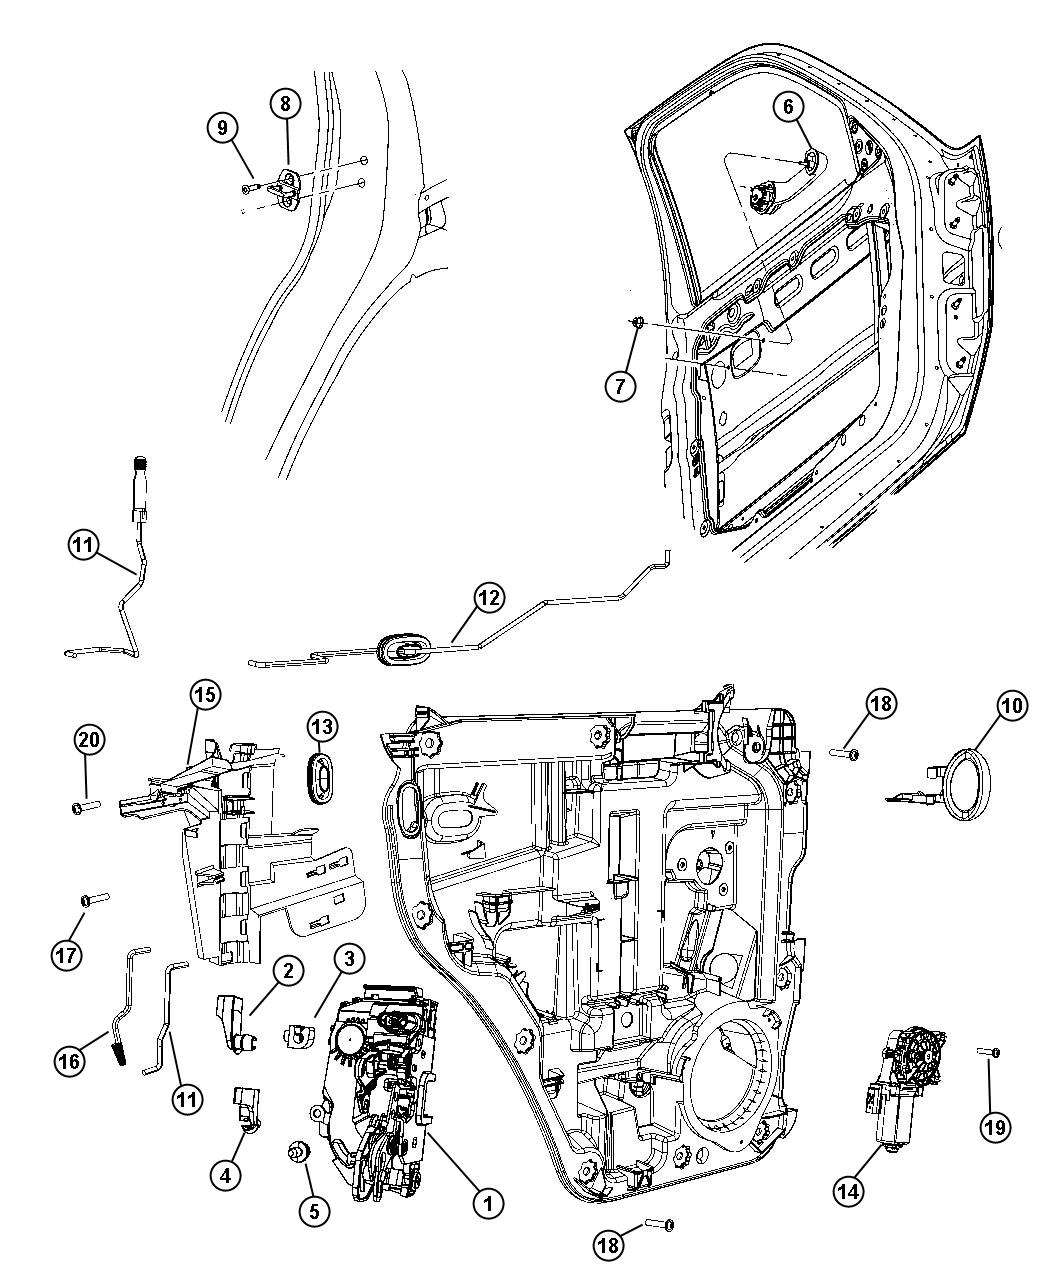 2007 Dodge Nitro SLT 3.7L V6 A/T 4X4 Handle. Inside remote